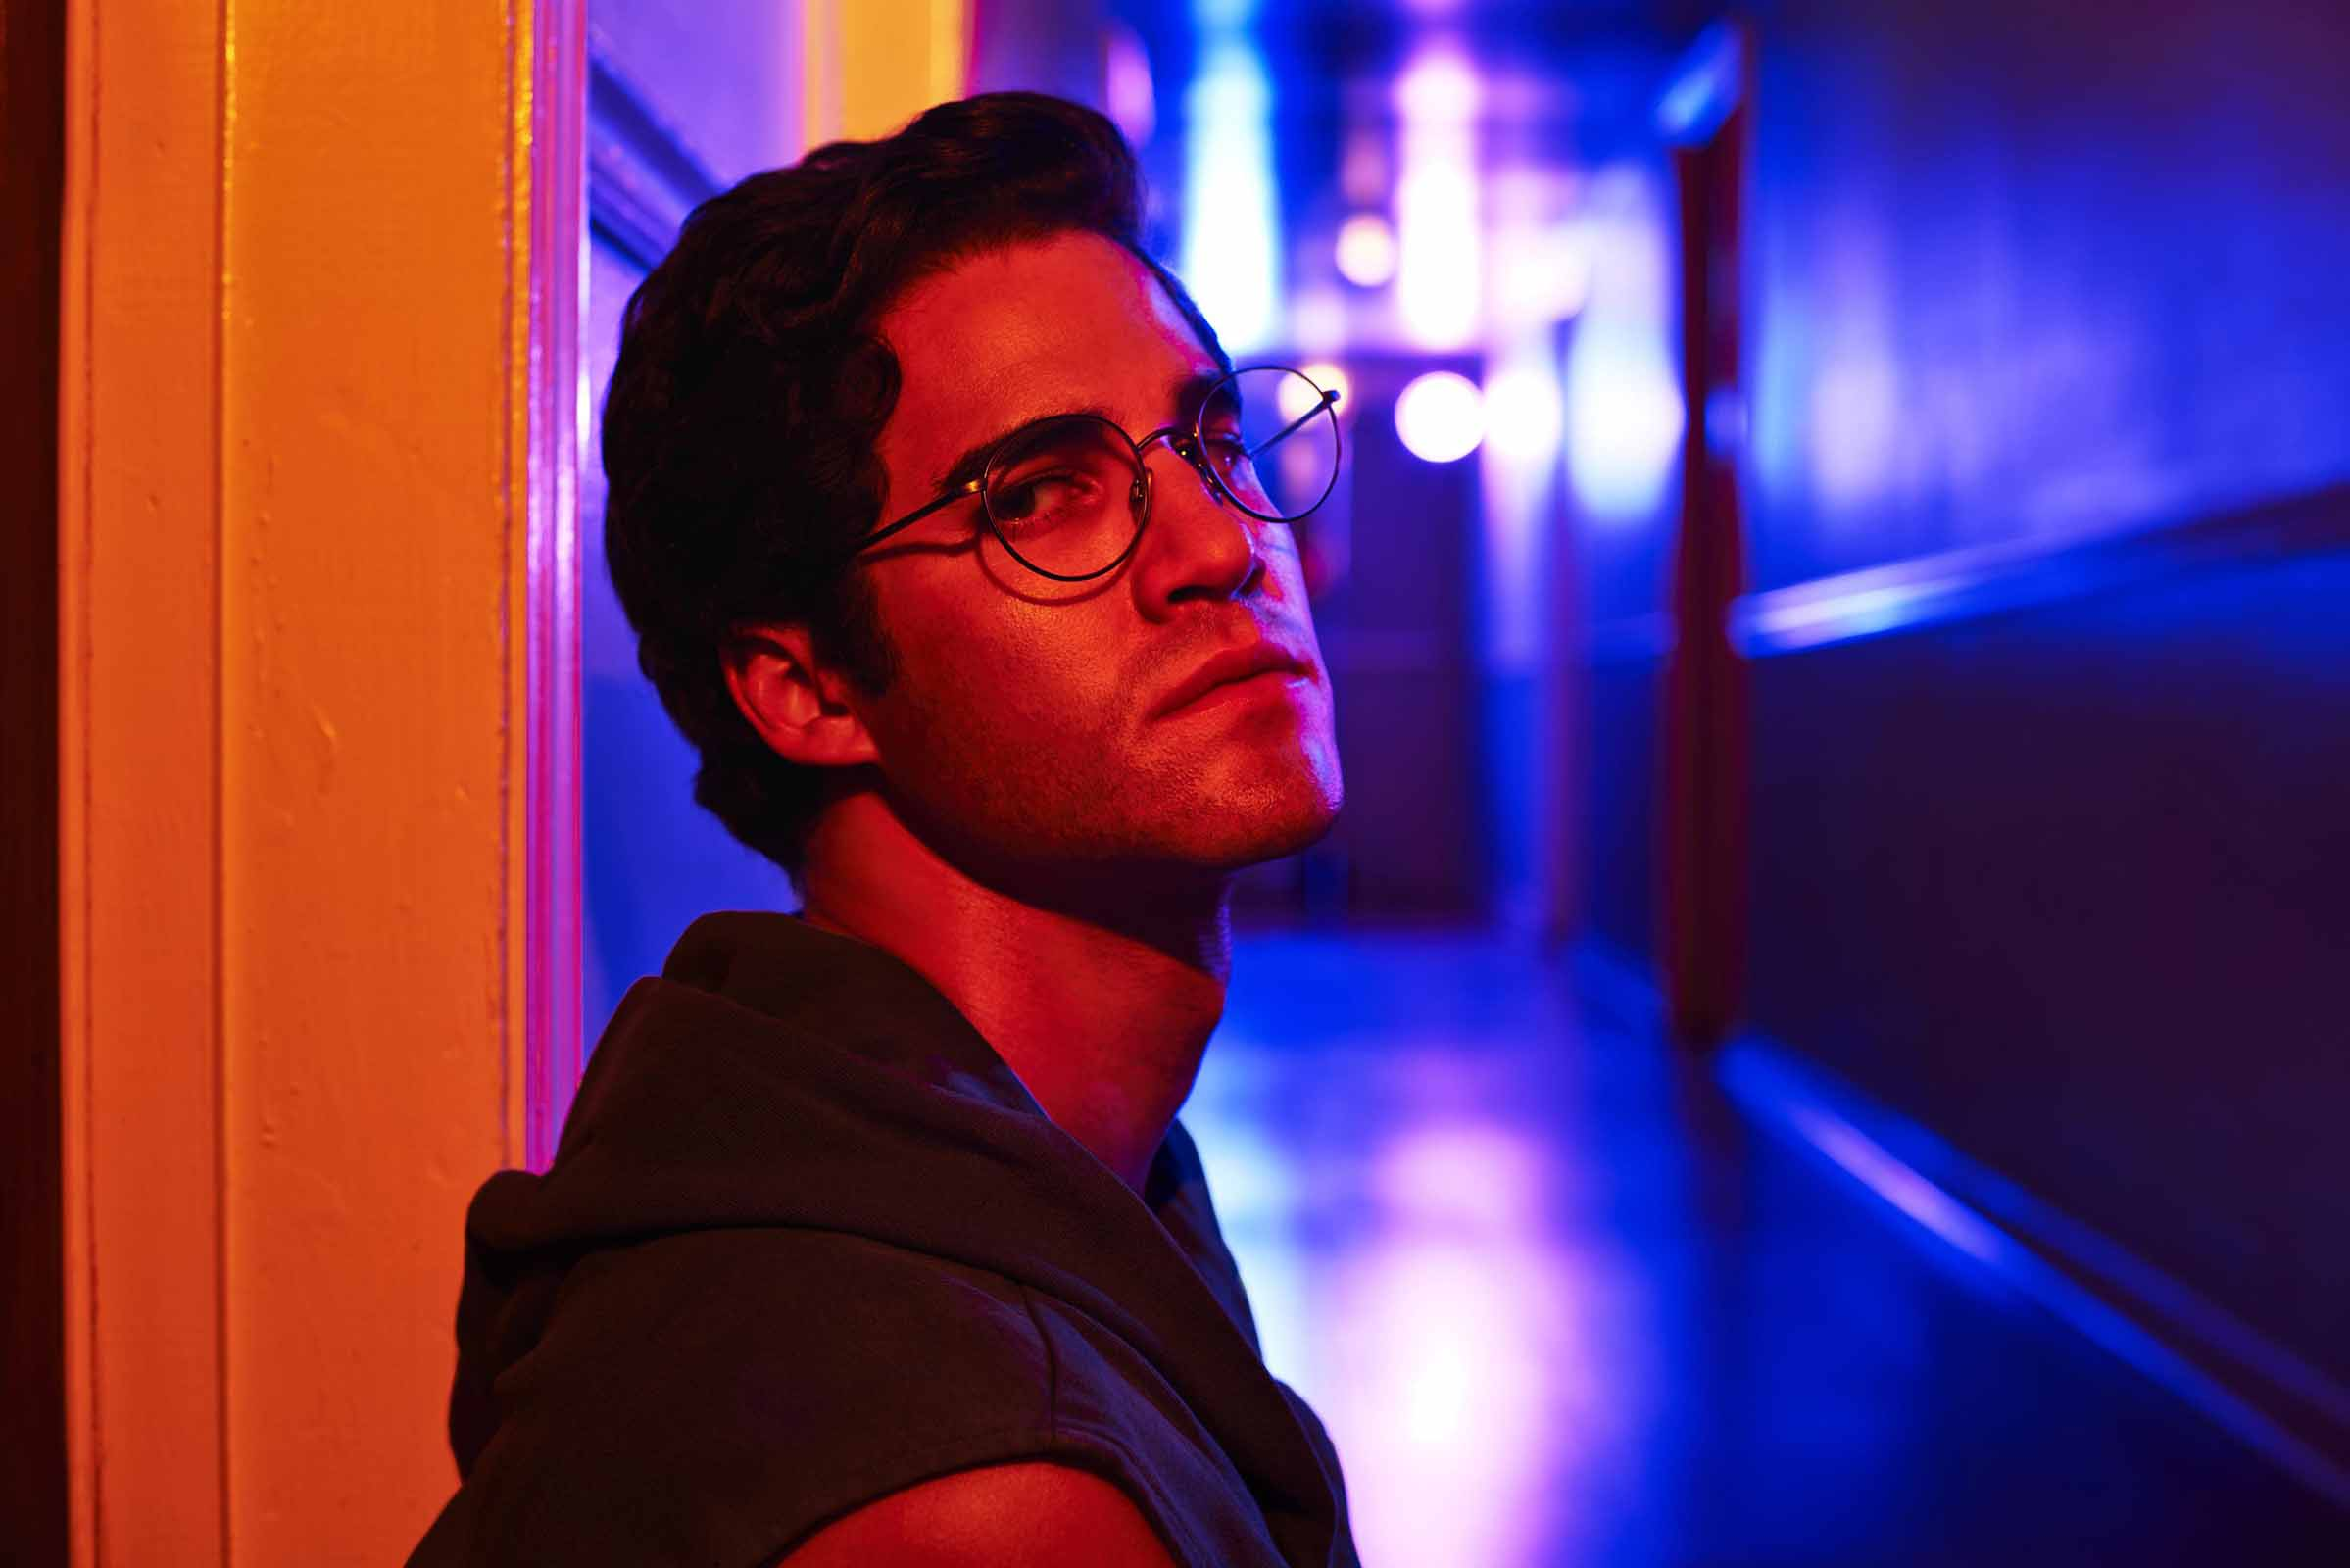 Ryan Murphy (American Horror Story) quitte FOX pour Netflix